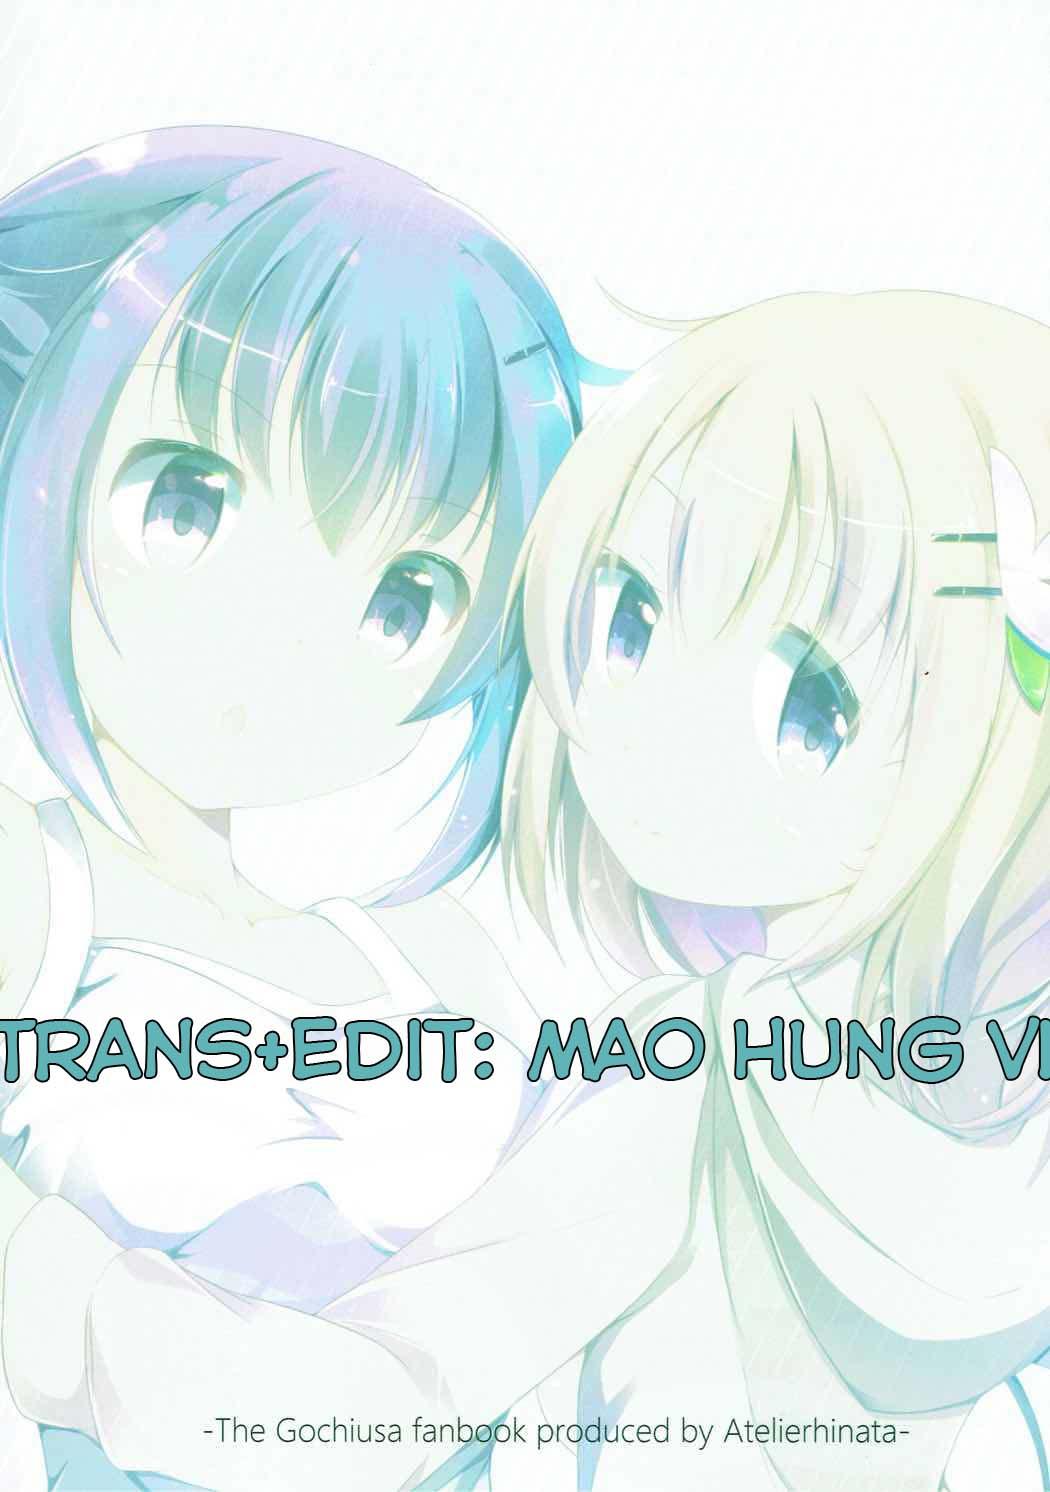 HentaiVN.net - Ảnh 22 - Find myself (Gochuumon wa Usagi desu ka?) - Oneshot